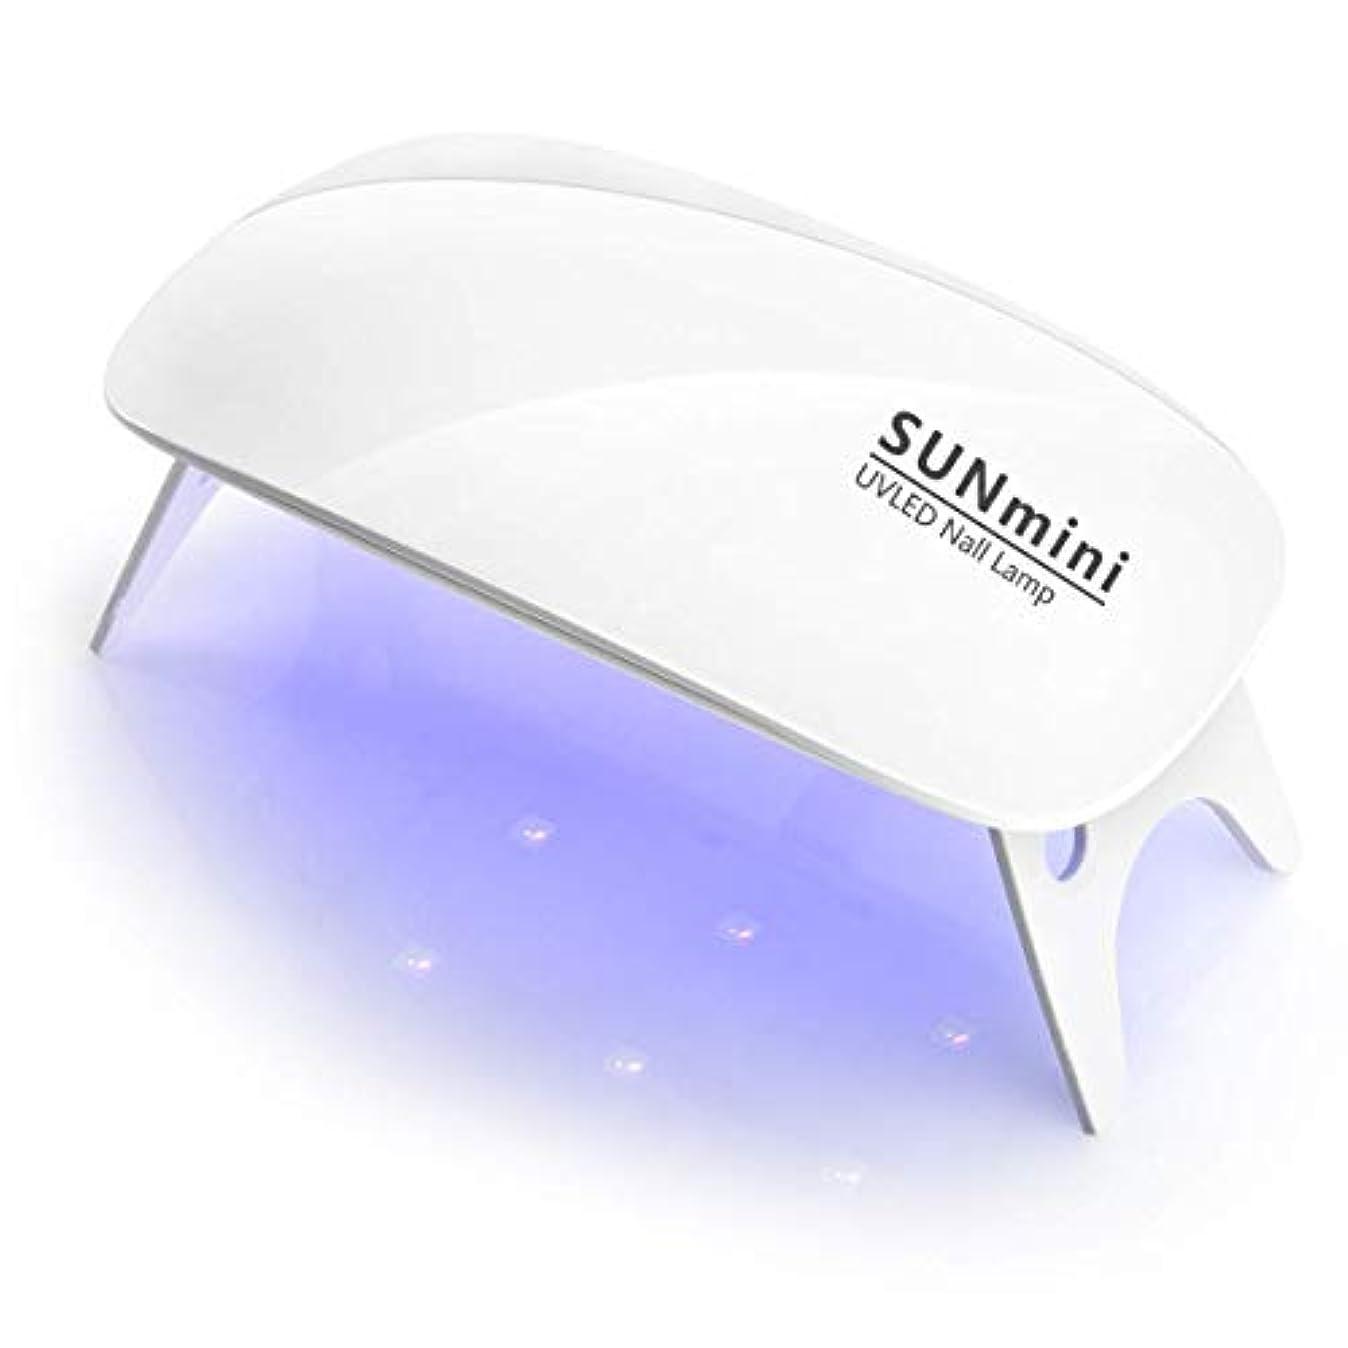 LEDネイルドライヤー LEDジェルネイルドライヤー UVライト ジェルネイルライト usbライト 硬化ライト LED タイマー設定可能 折りたたみ式 軽量 持ち運び便利(ホワイト ネイルファイルが付け) FACAI